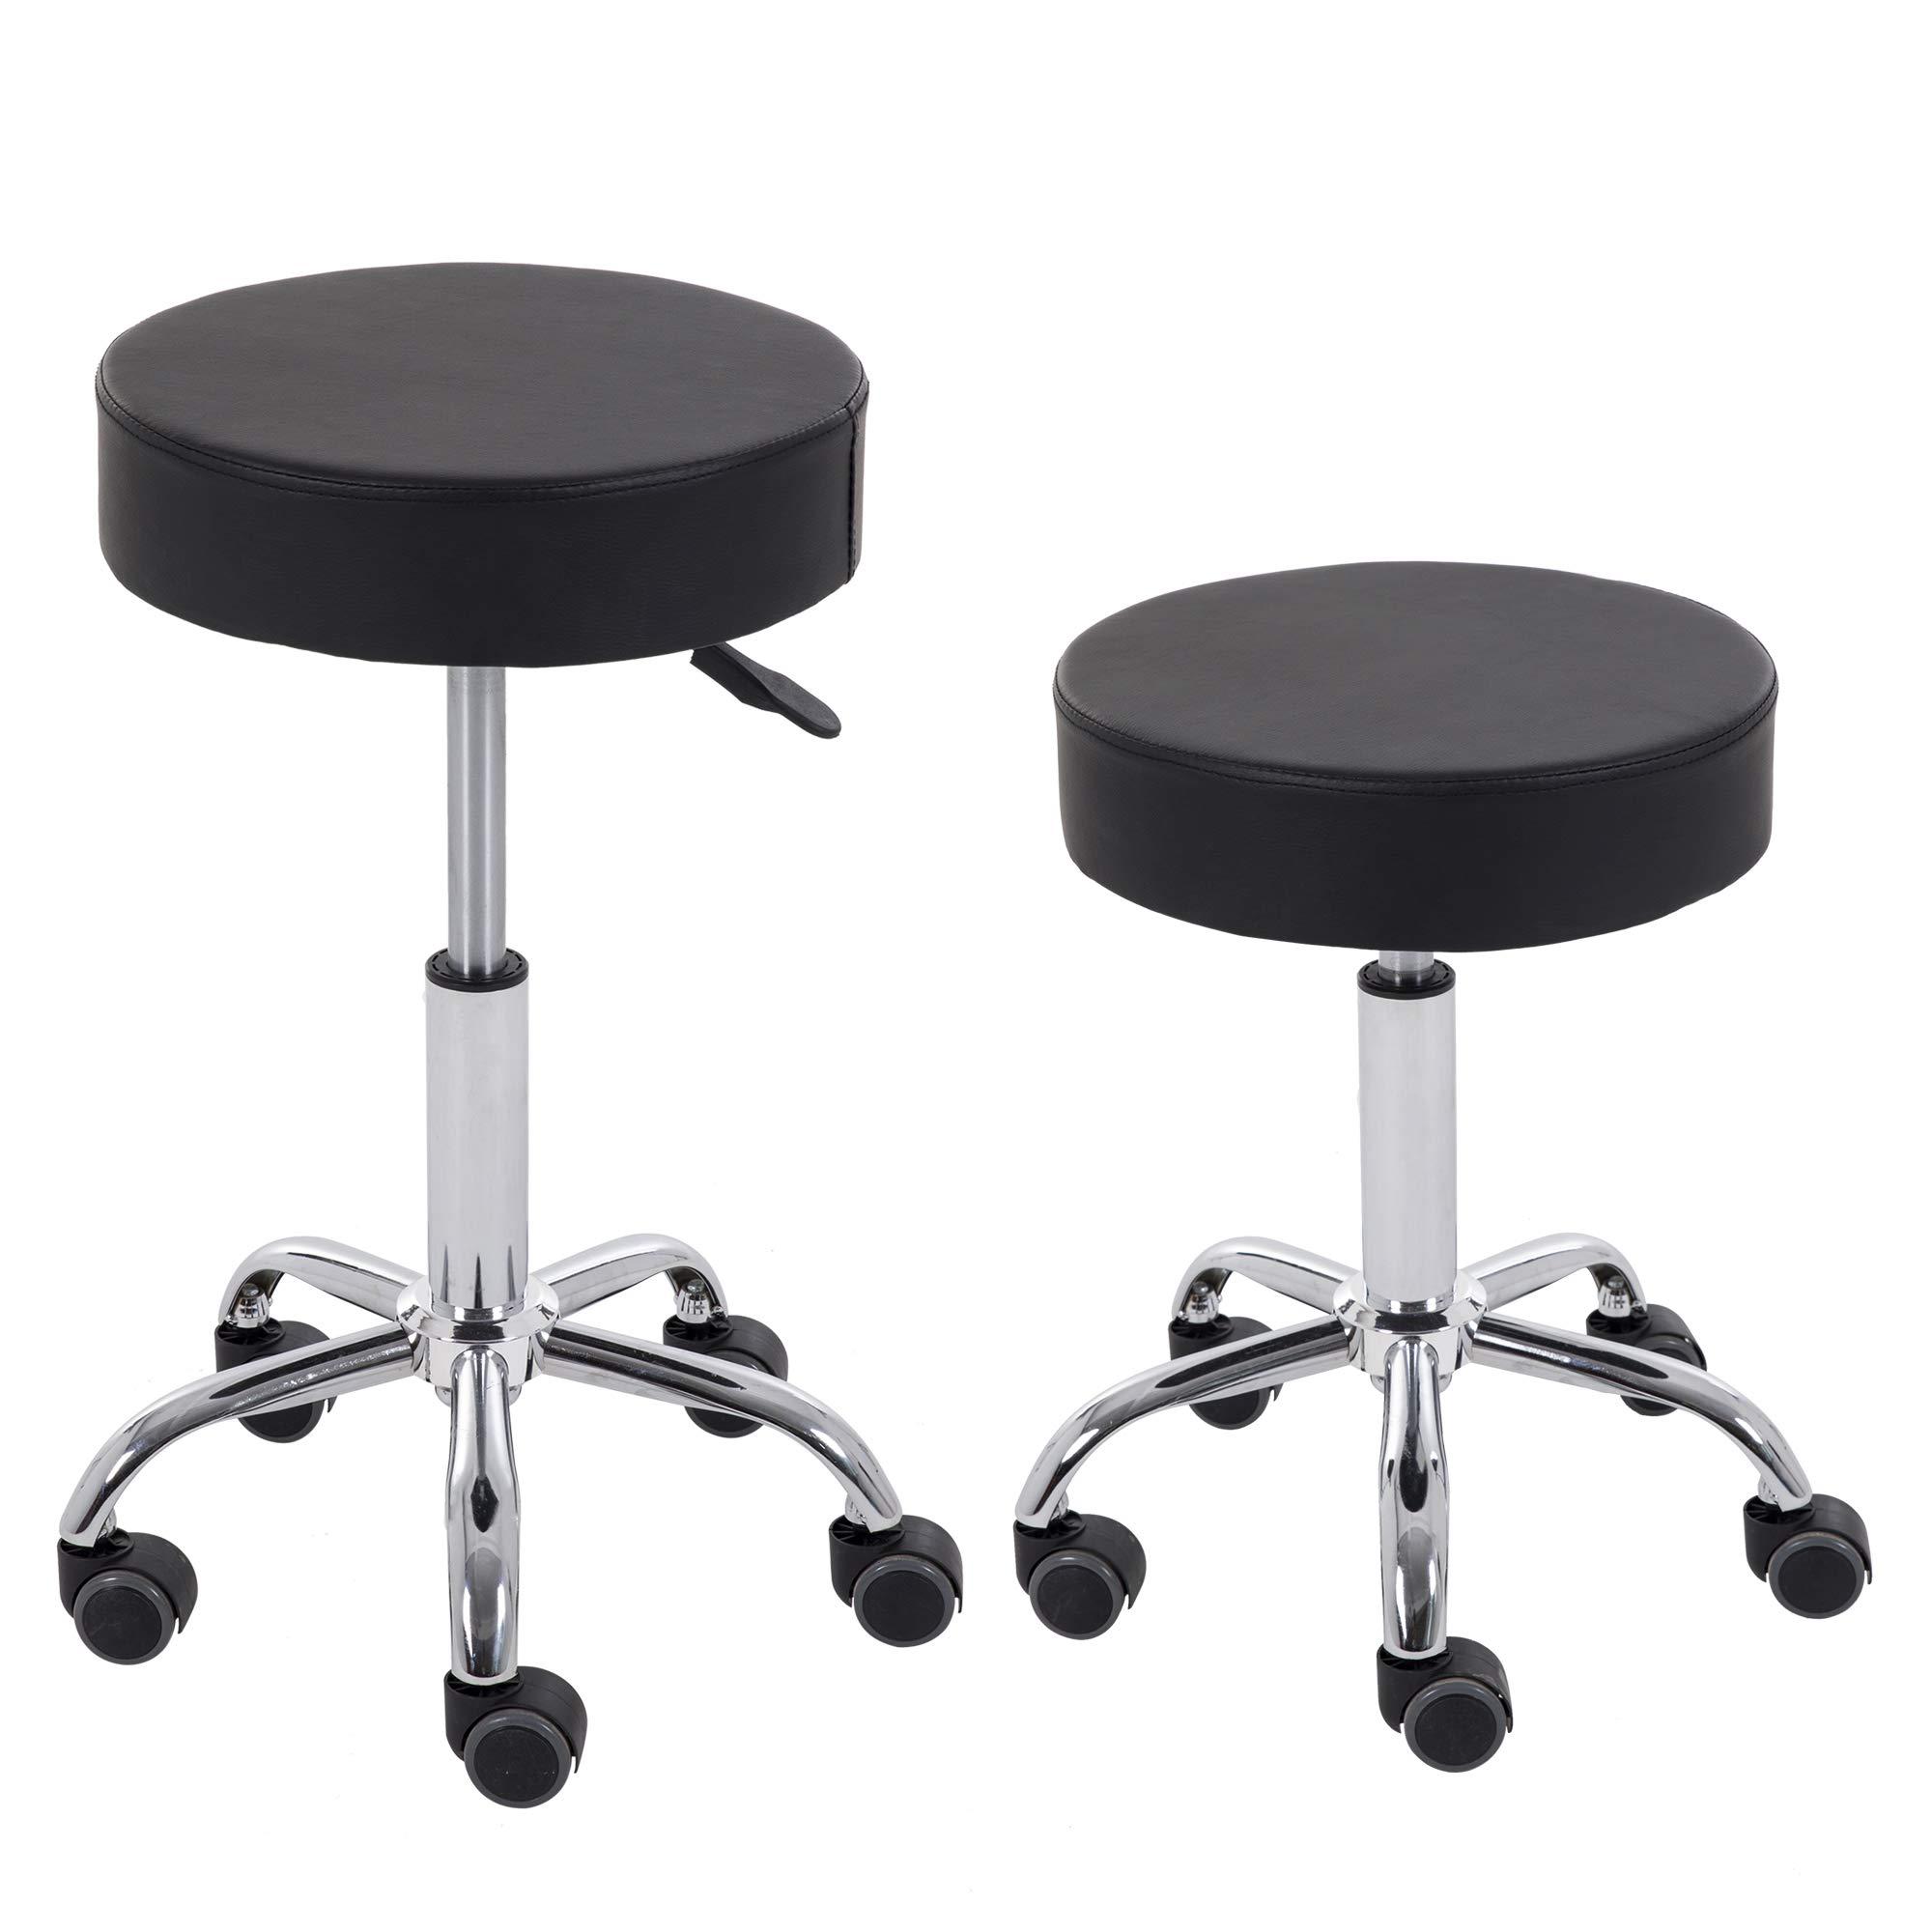 Set of 2 Adjustable Rolling Swivel Spa Salon Drafting Stool Chair PU Leather Cushion Black